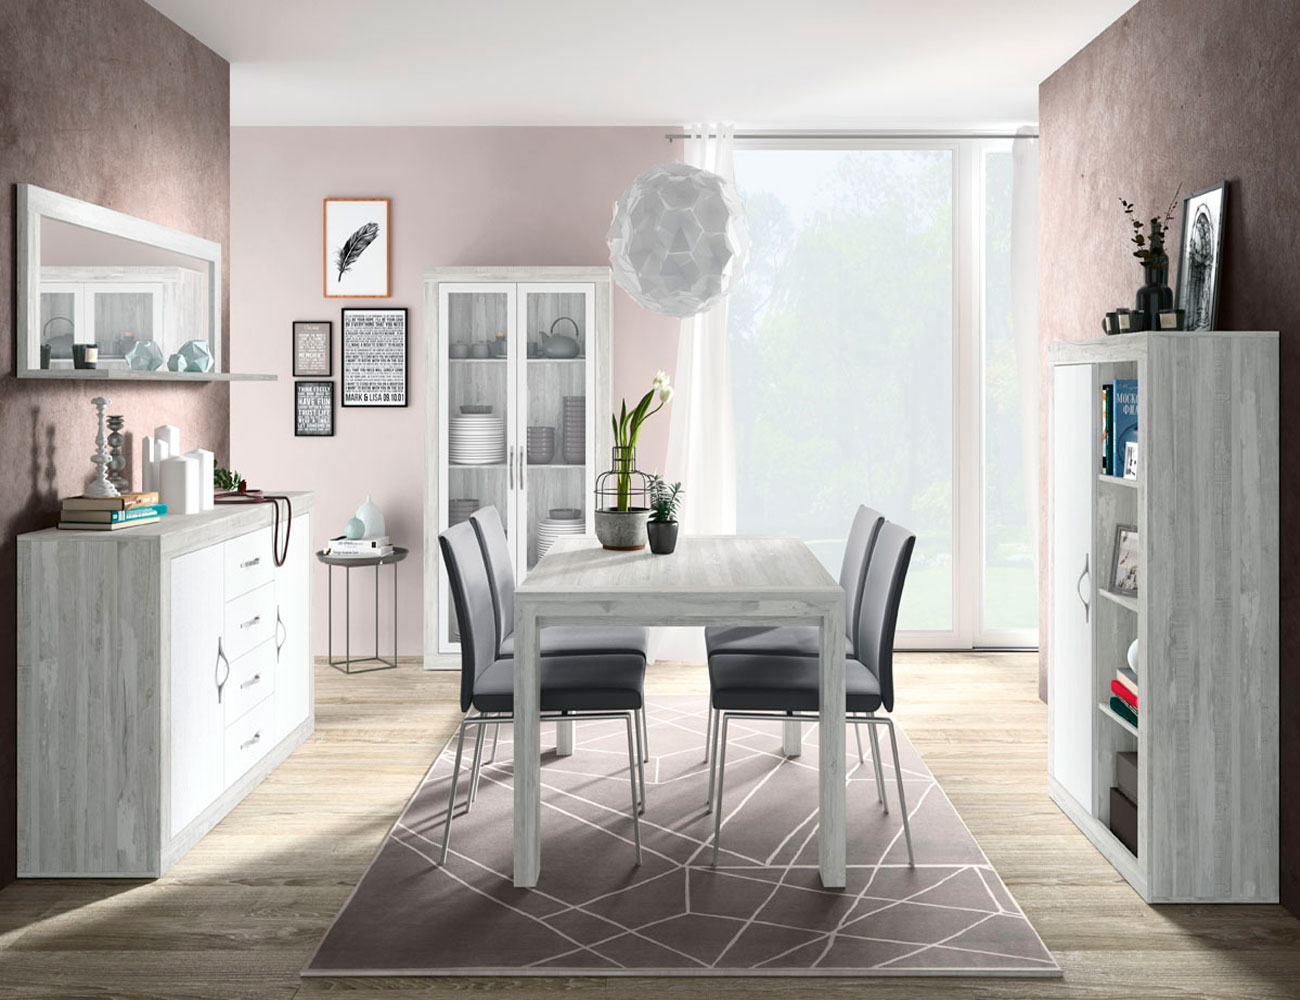 158 salon comedor vitrina aparador modulo 1 puerta mesa artic soul blanco